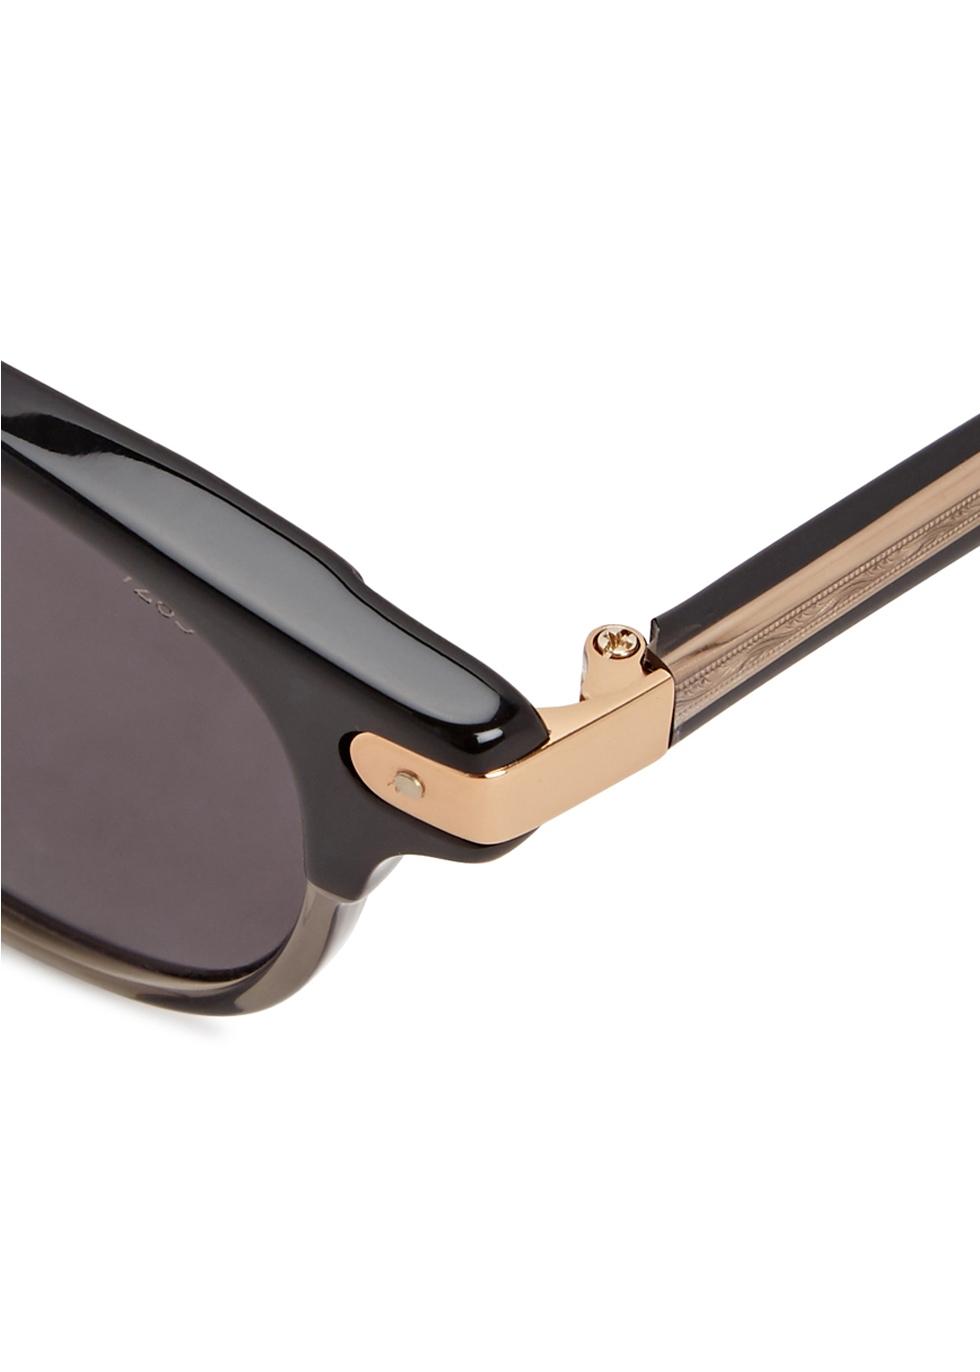 Black clubmaster-style sunglasses - EYEVAN7285